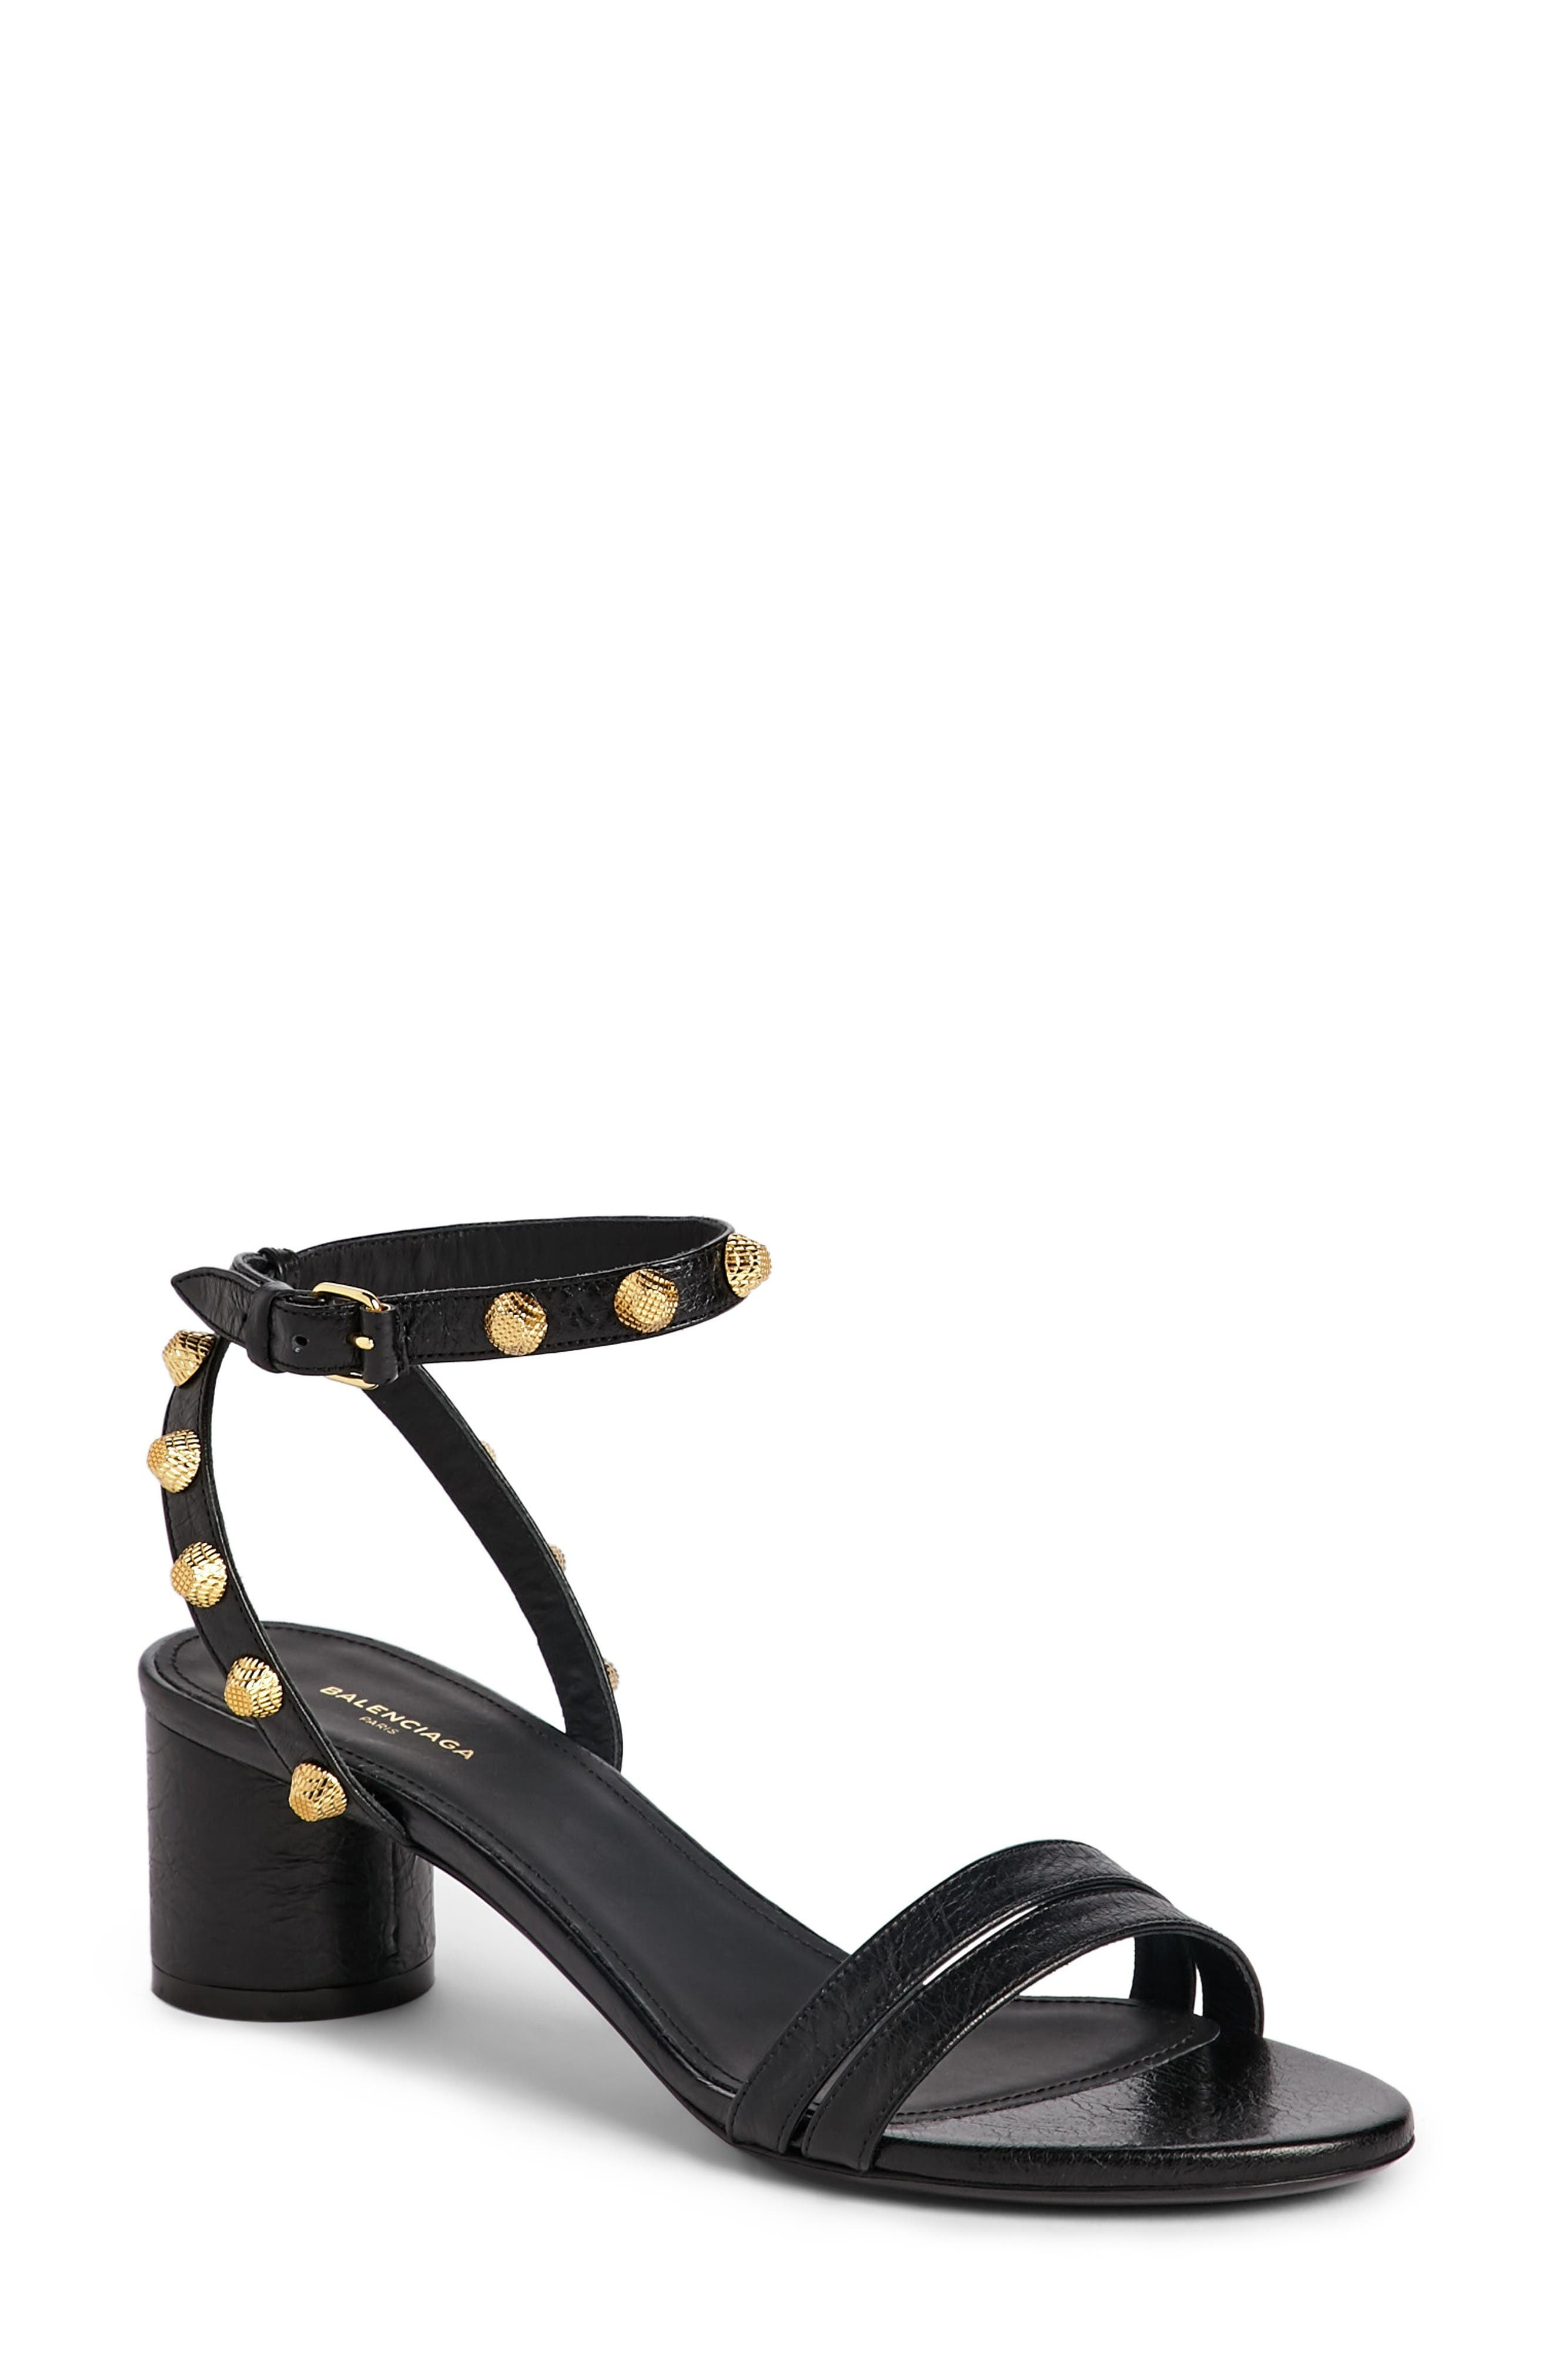 Main Image - Balenciaga Studded Ankle Strap Sandal